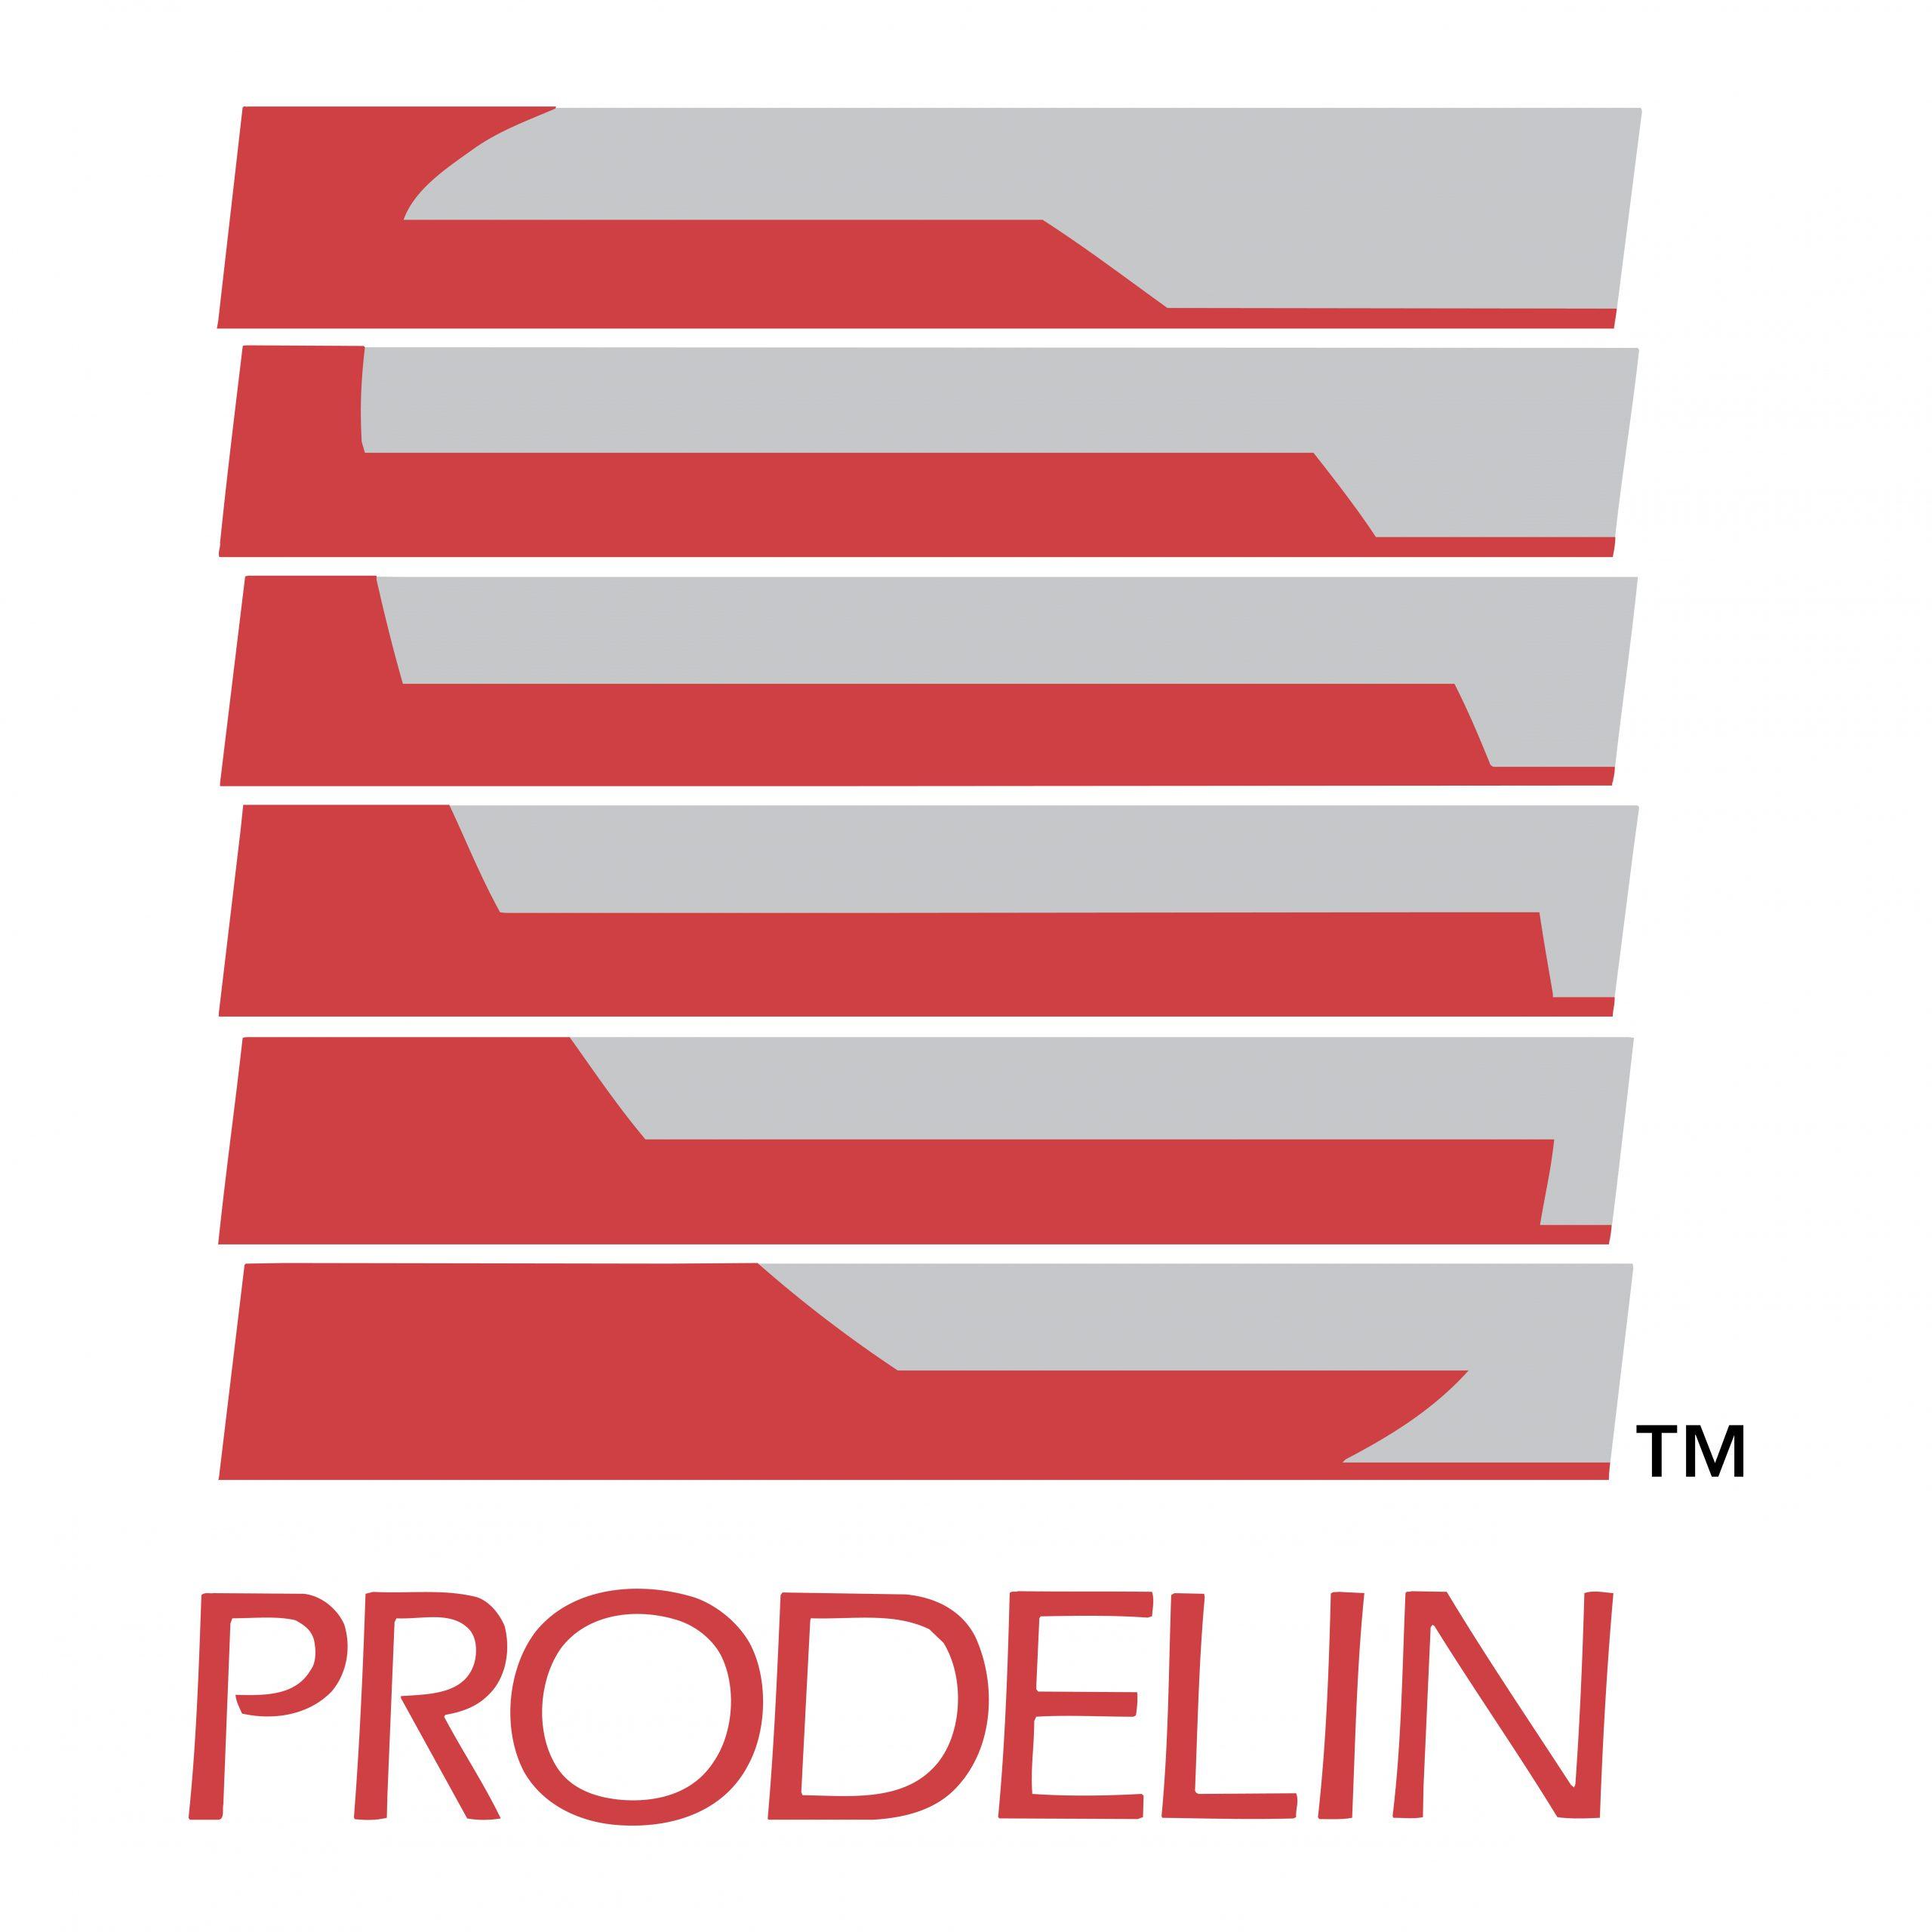 Prodelin